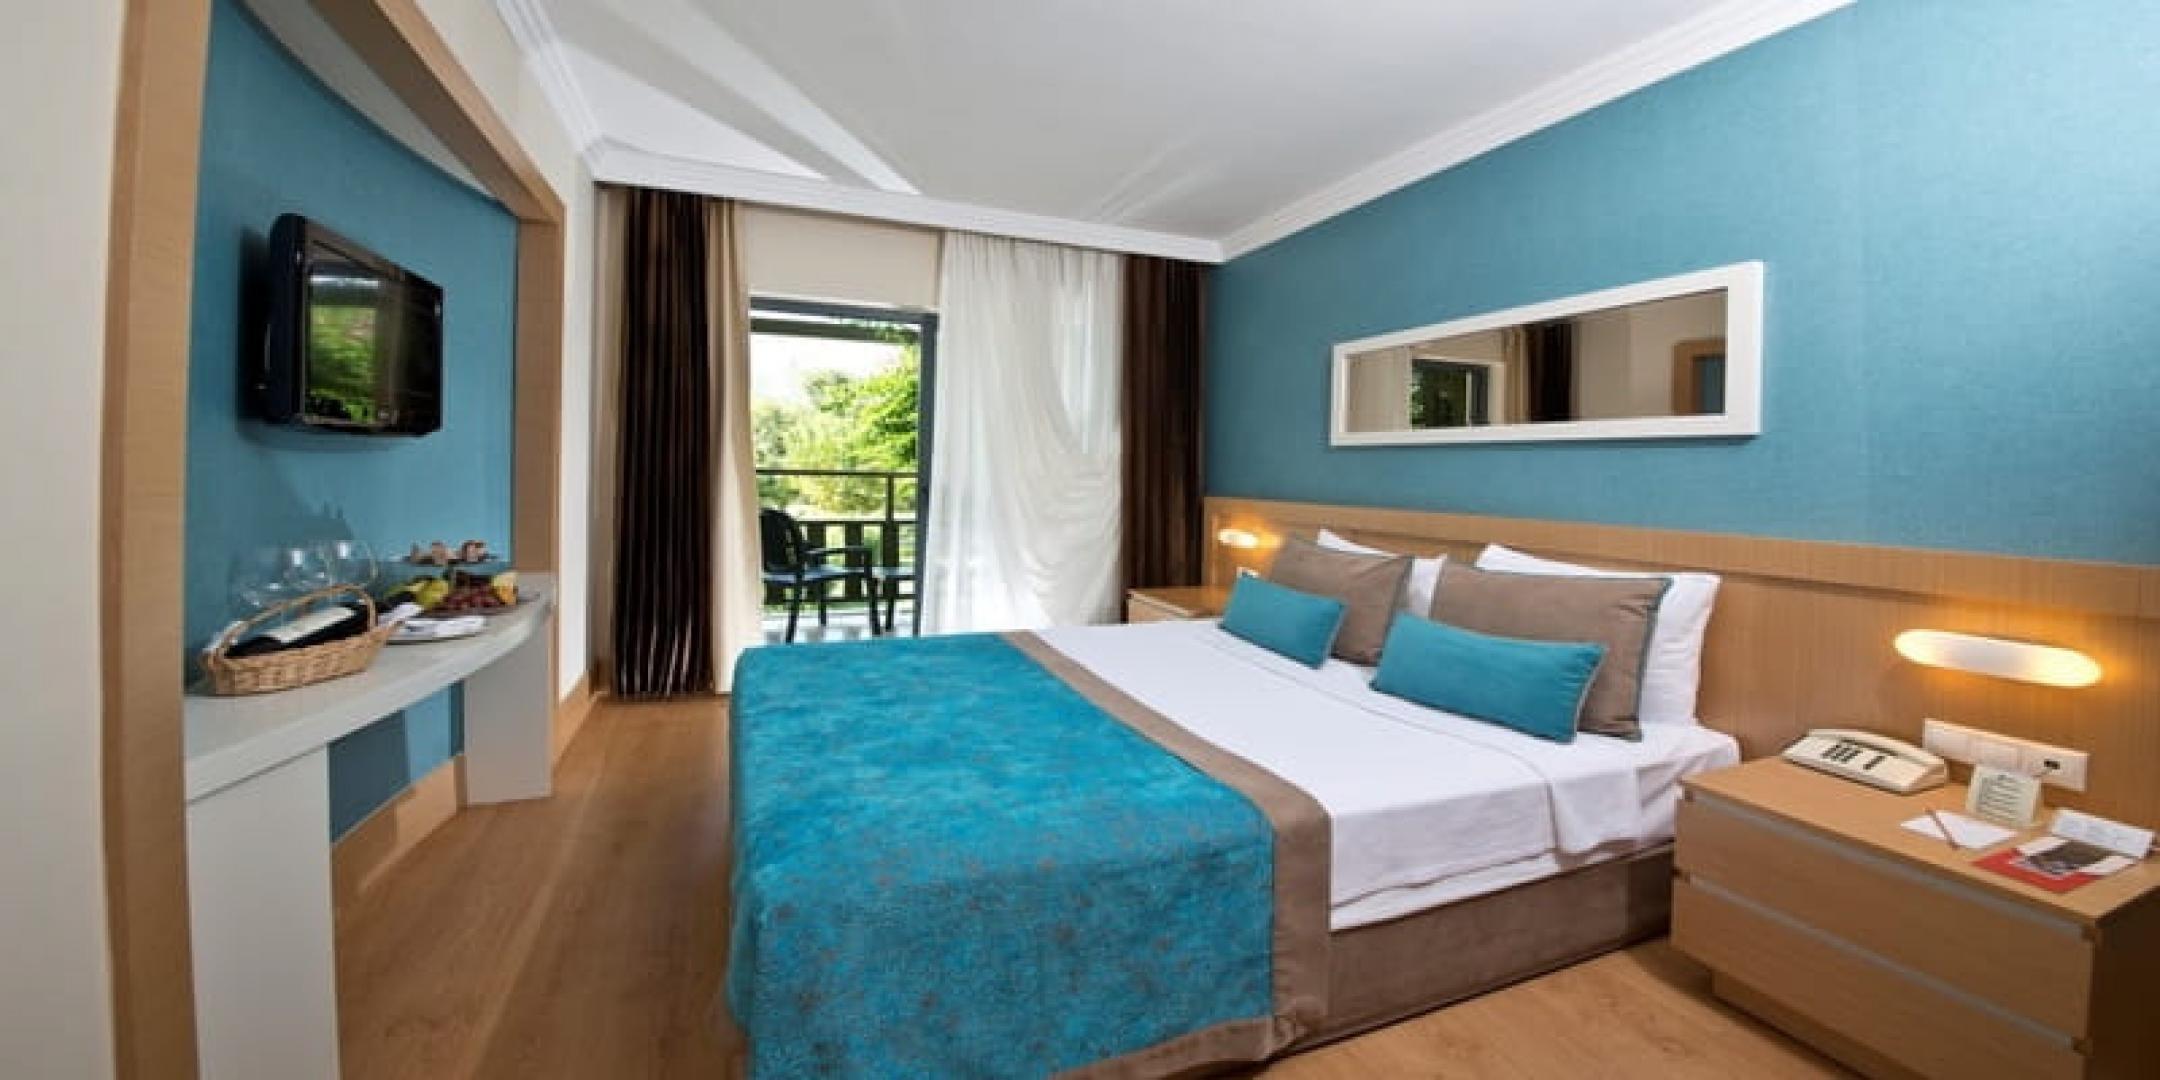 Limak Limra Hotel & Resort - стая